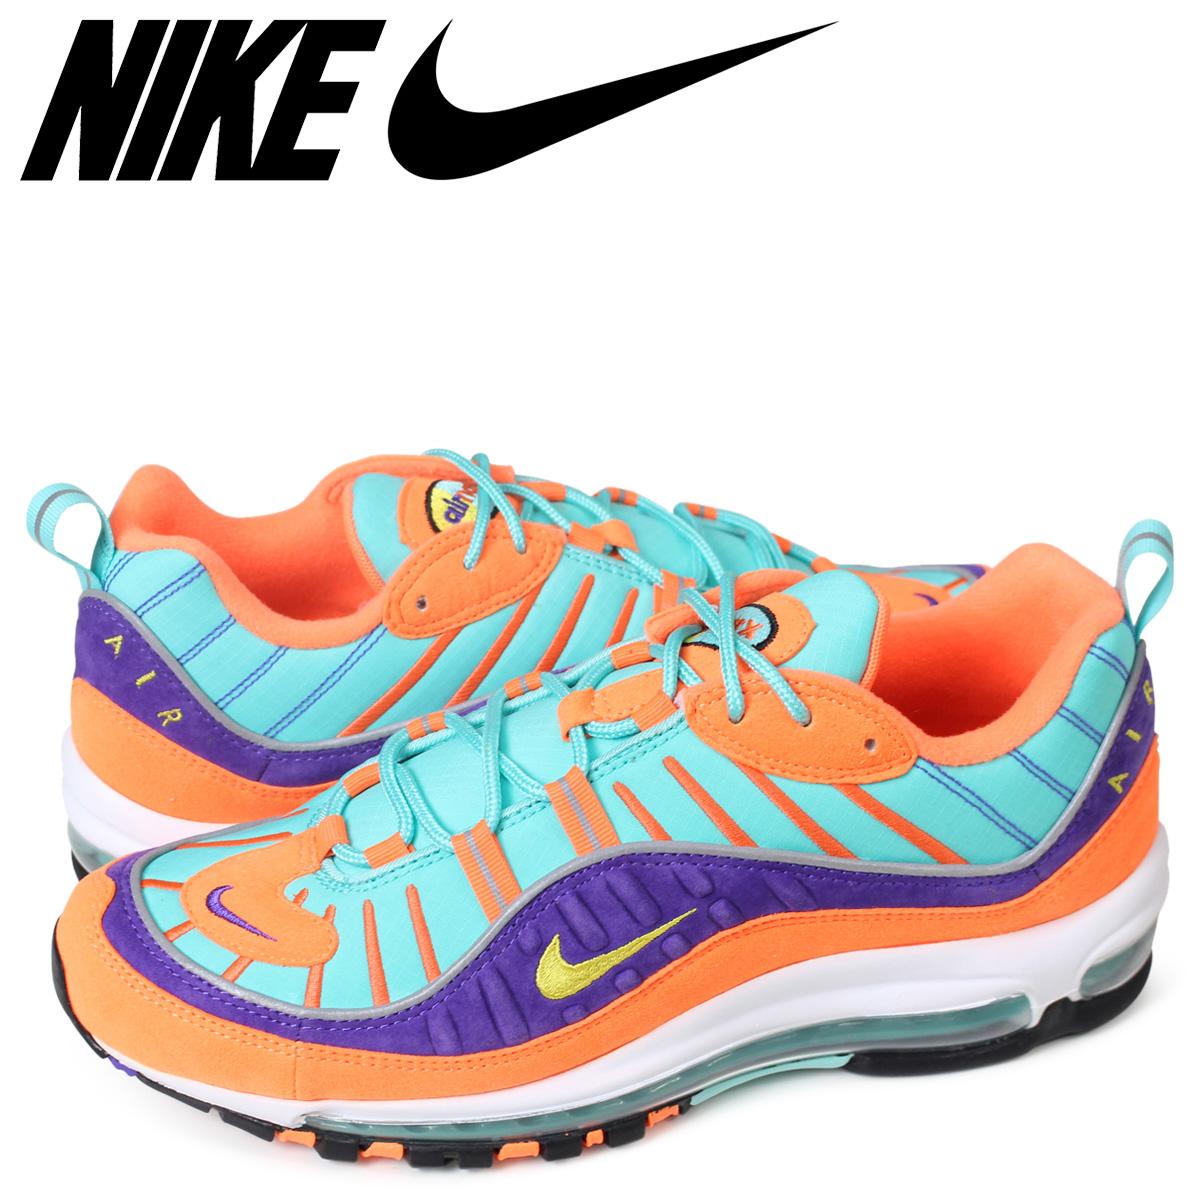 lowest price 0f269 57f9c NIKE AIR MAX 98 QS Kie Ney AMAX 98 sneakers men 924,462-800 orange